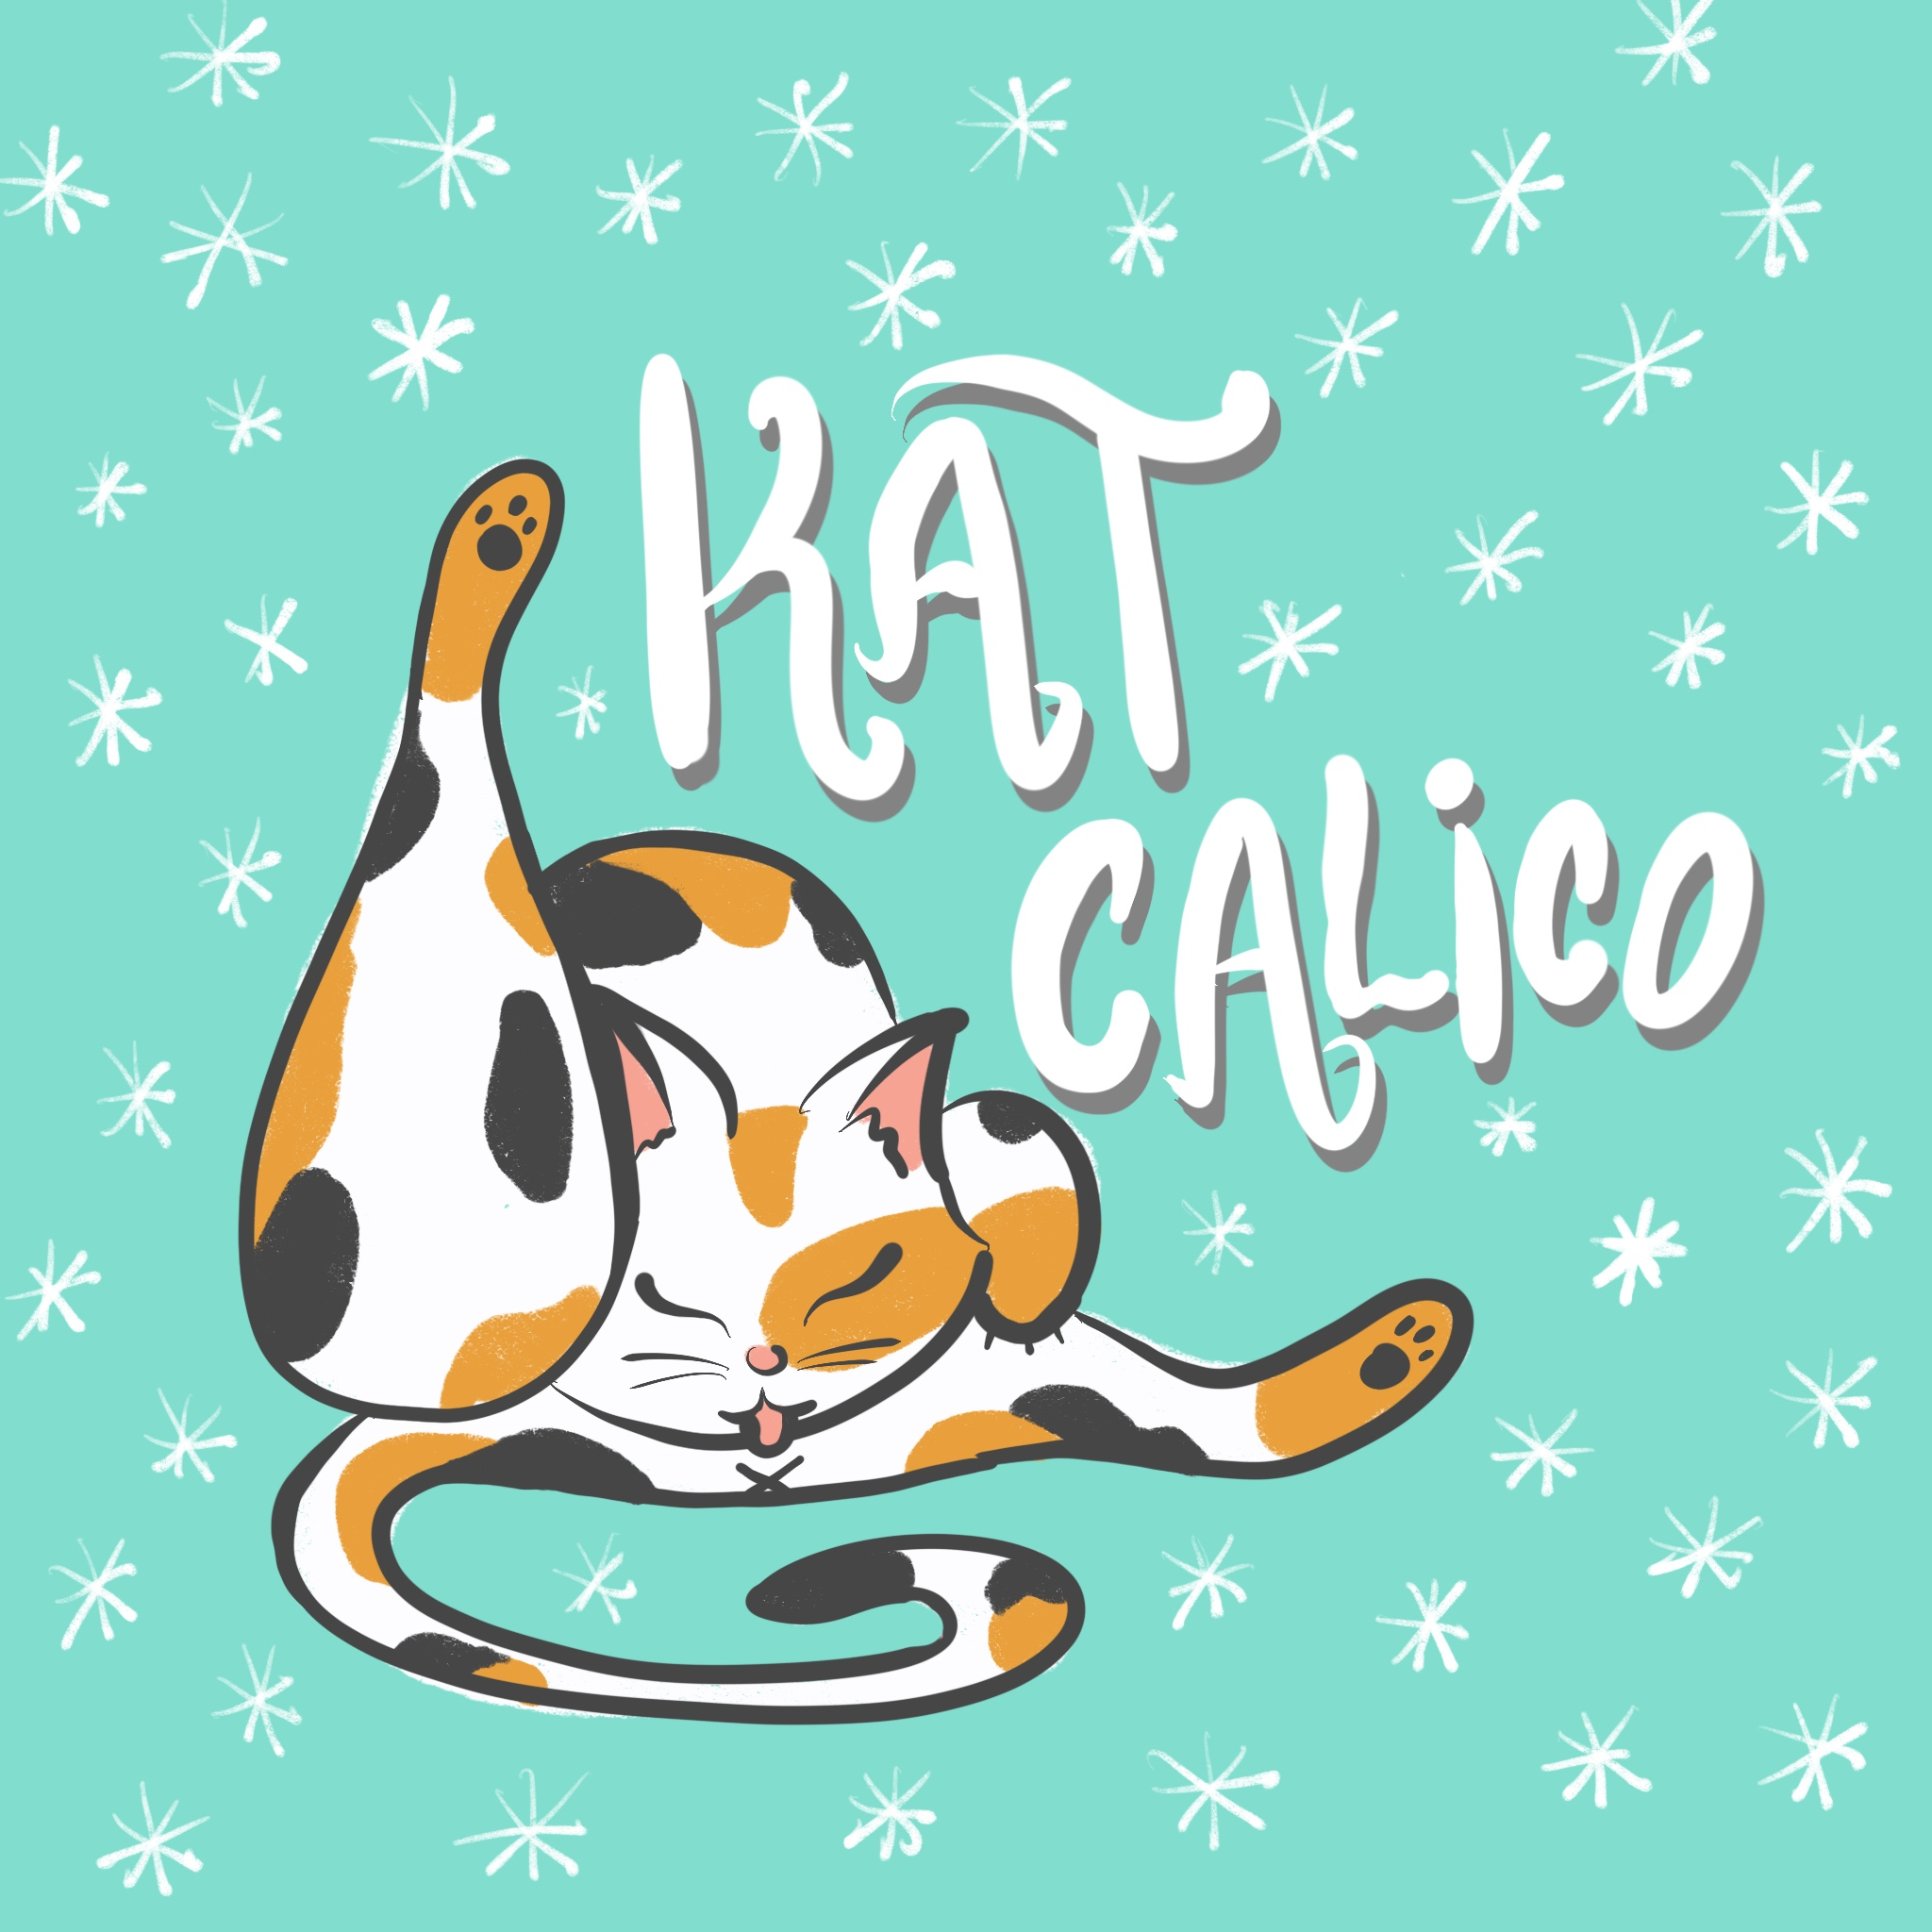 Kat Calico